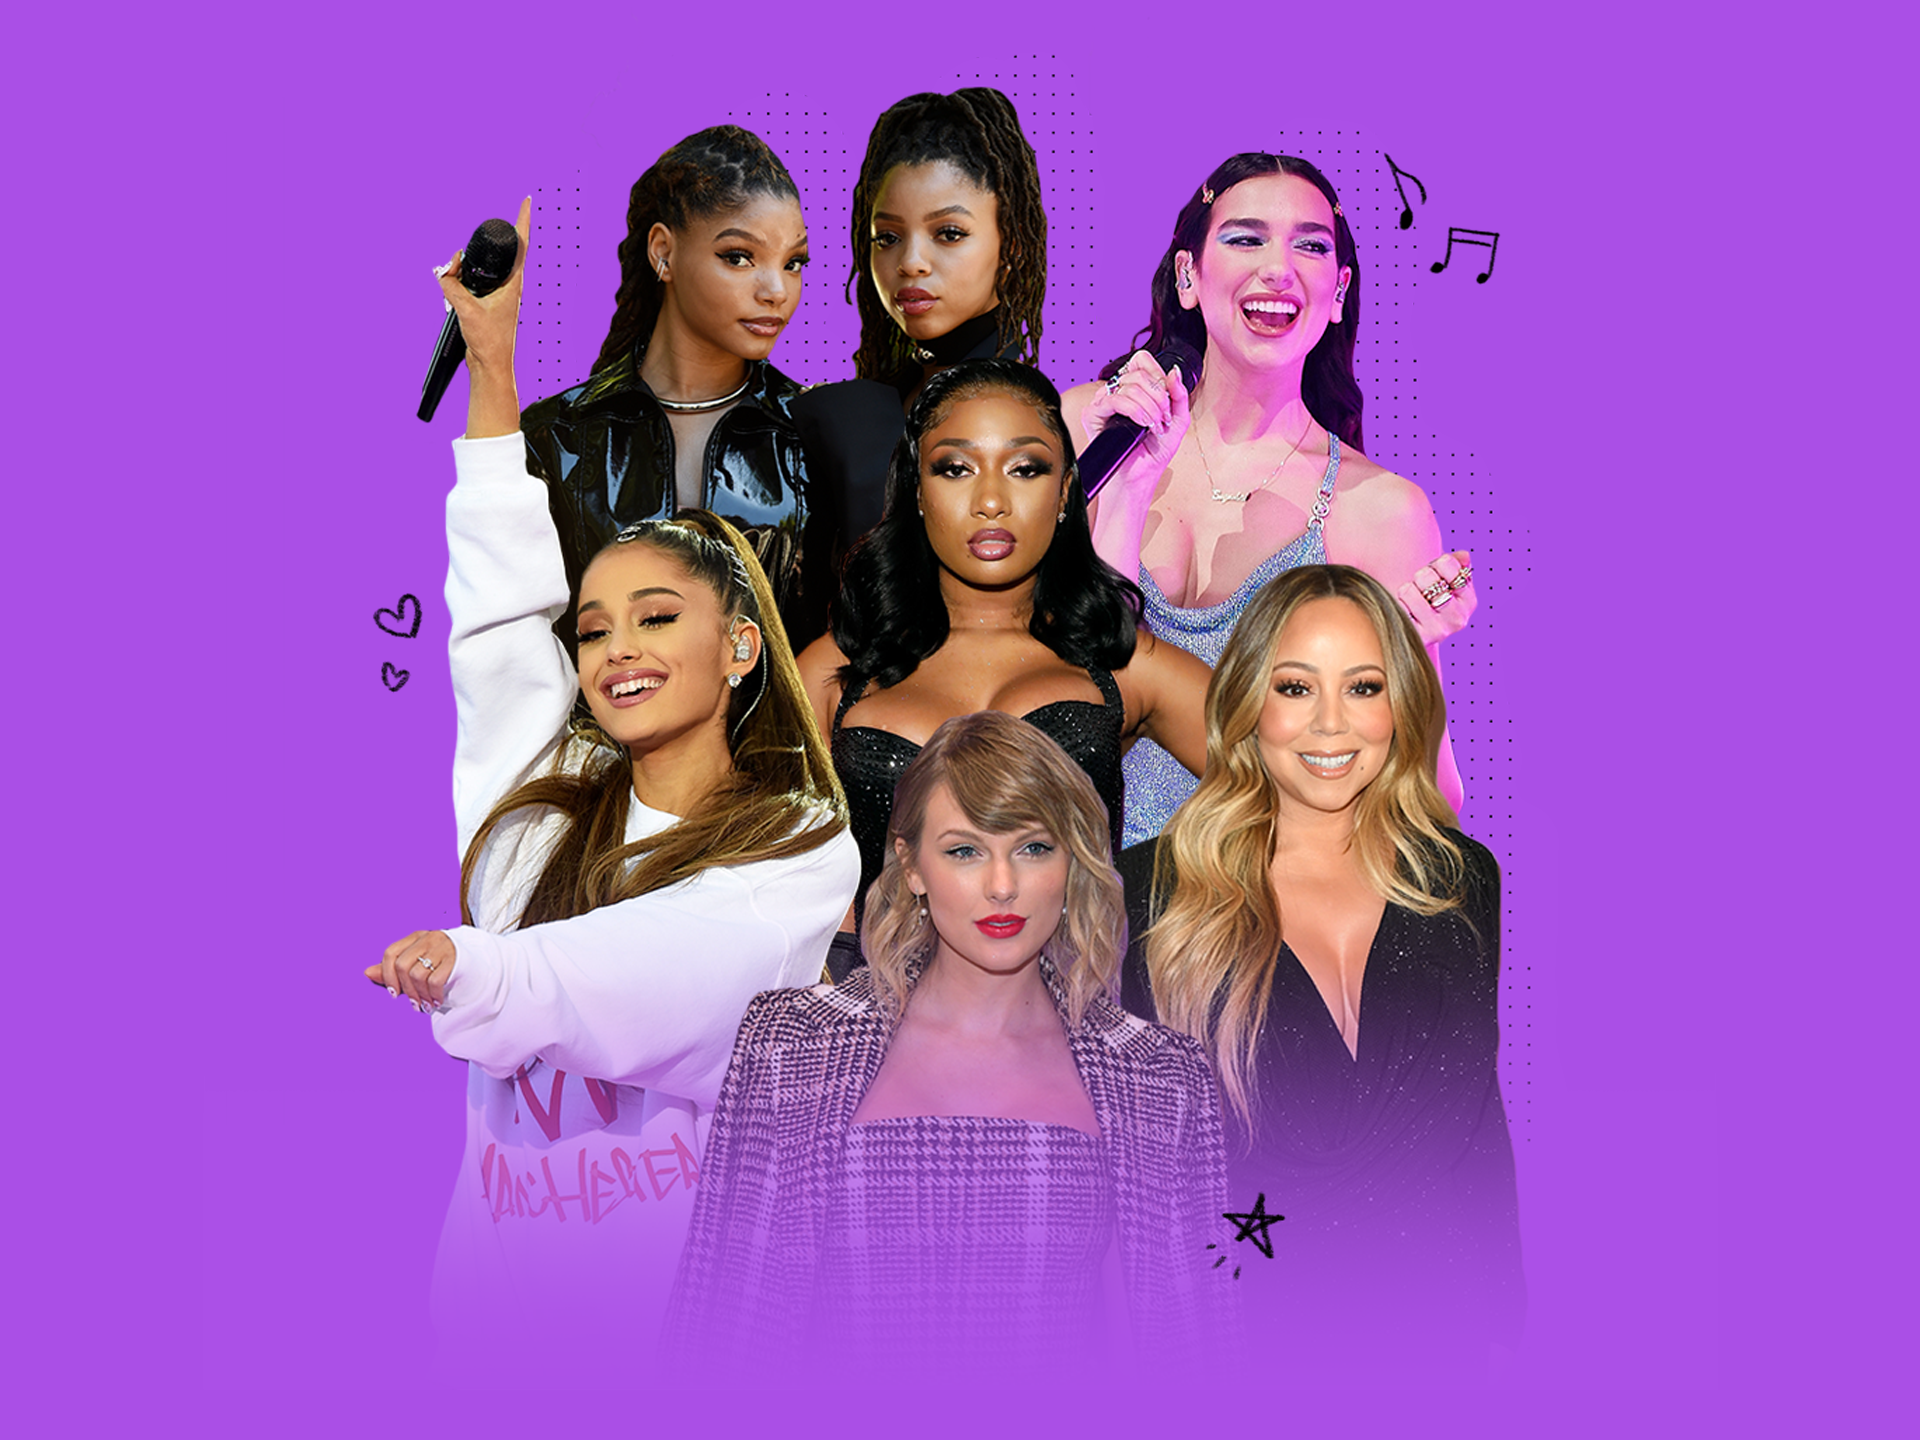 Ariana Grande, Dua Lipa, Megan Thee Stallion brought happiness to 2020